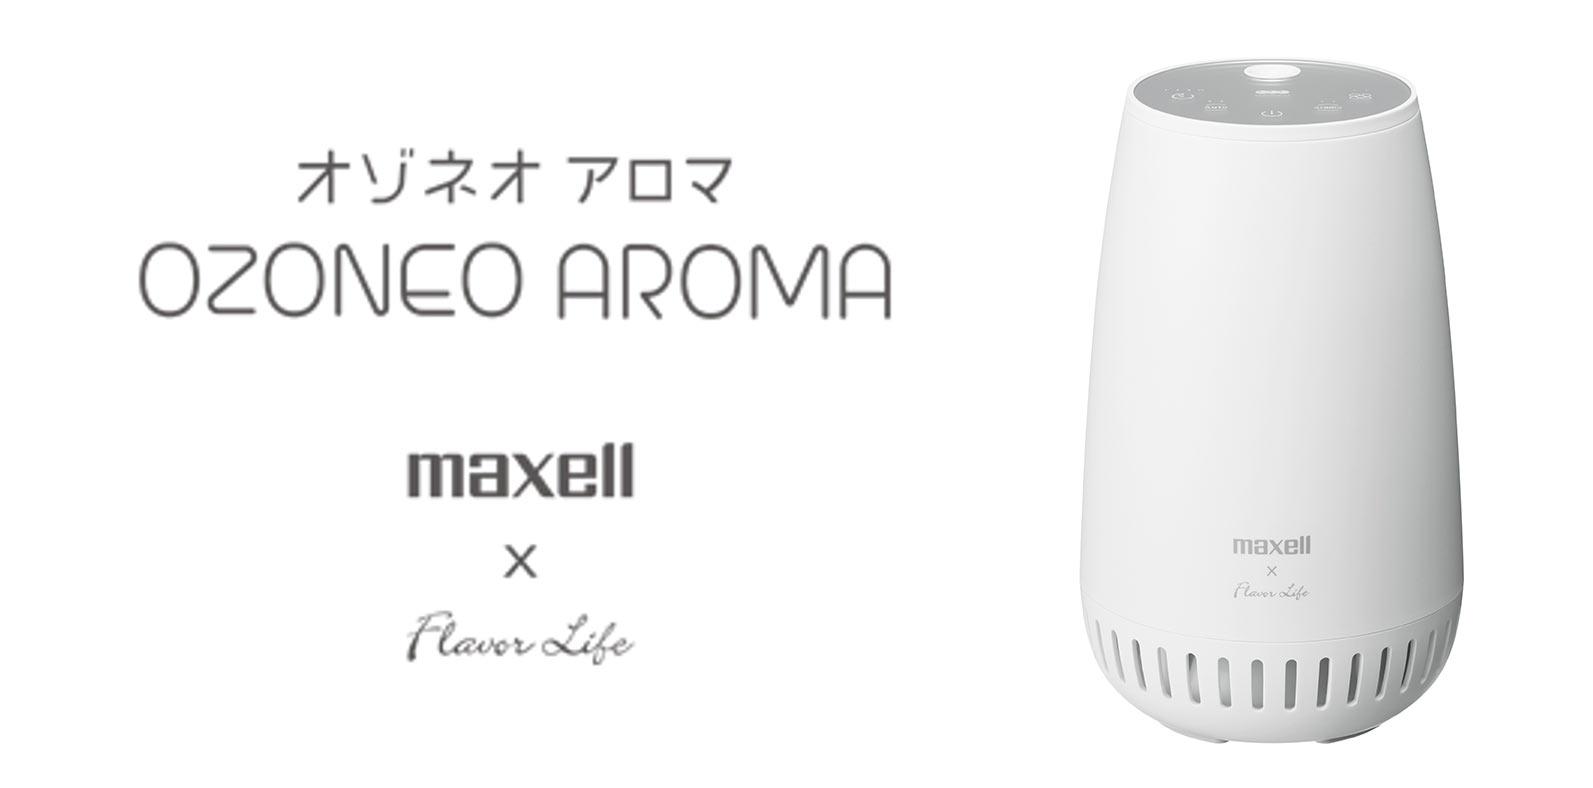 Maxell マクセル オゾネオアロマ MXAP-FAE275R